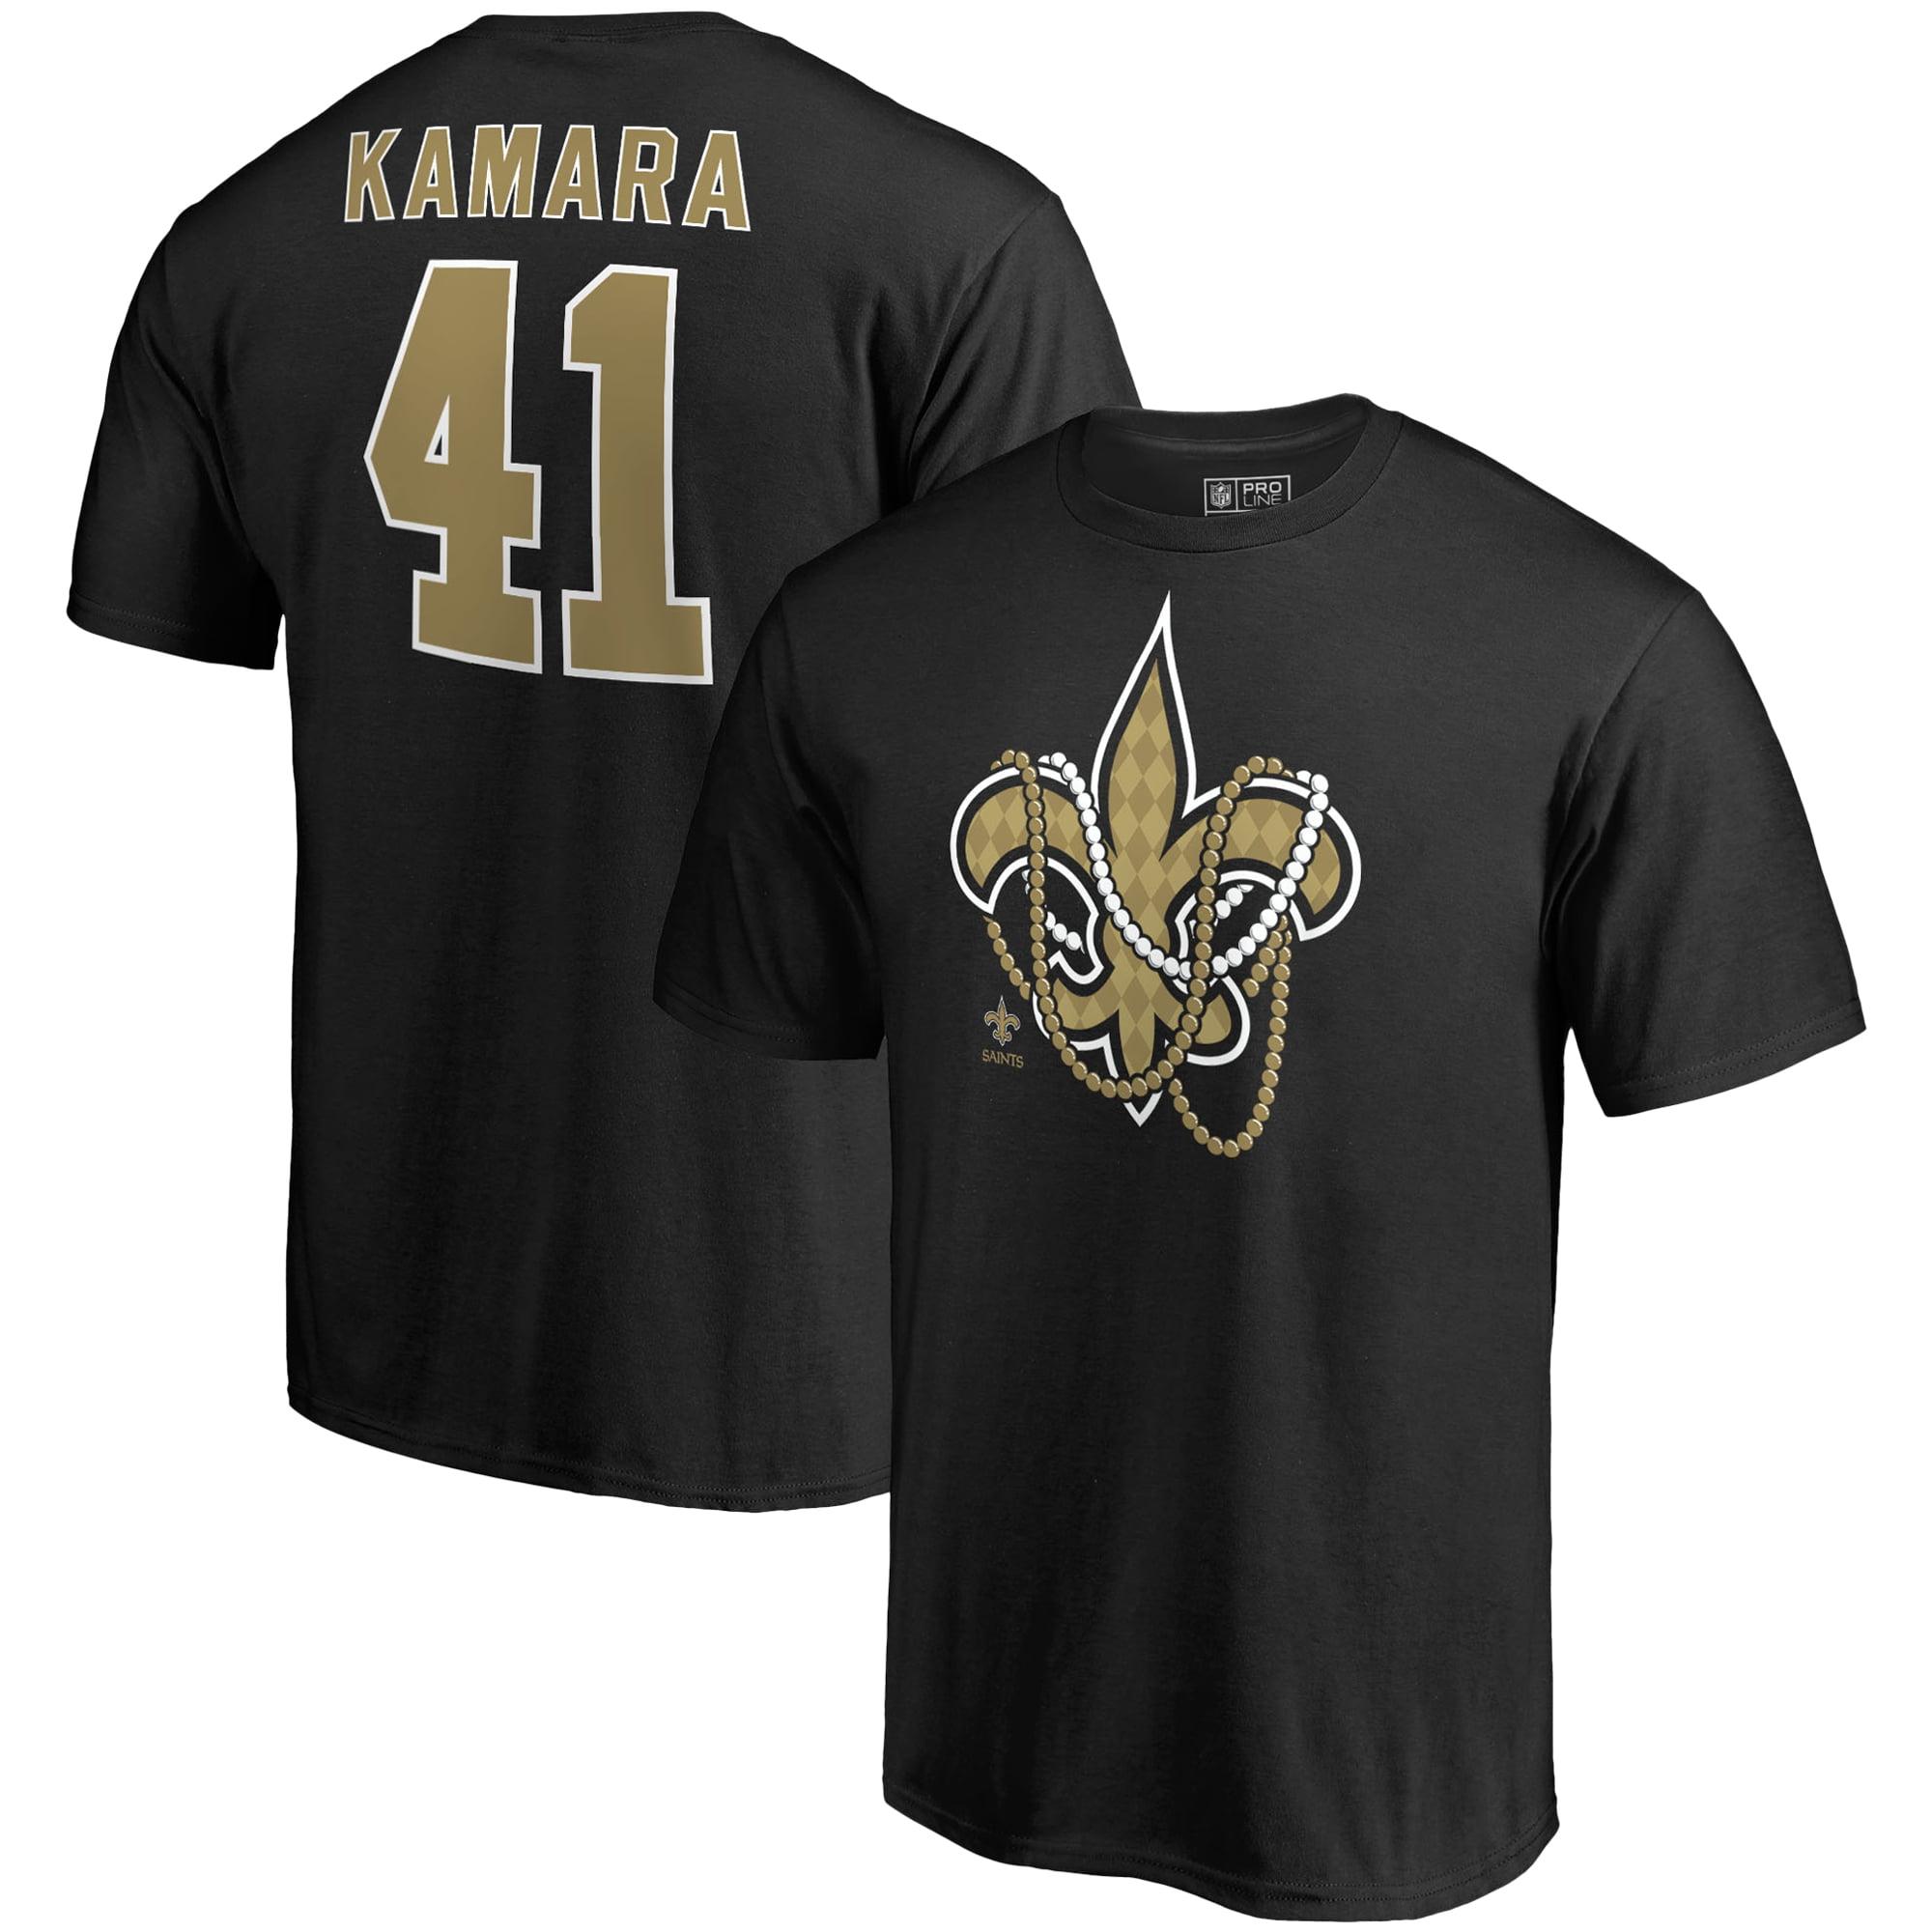 Alvin Kamara New Orleans Saints NFL Pro Line by Fanatics Branded Mardi Gras Team Icon Name & Number T-Shirt - Black